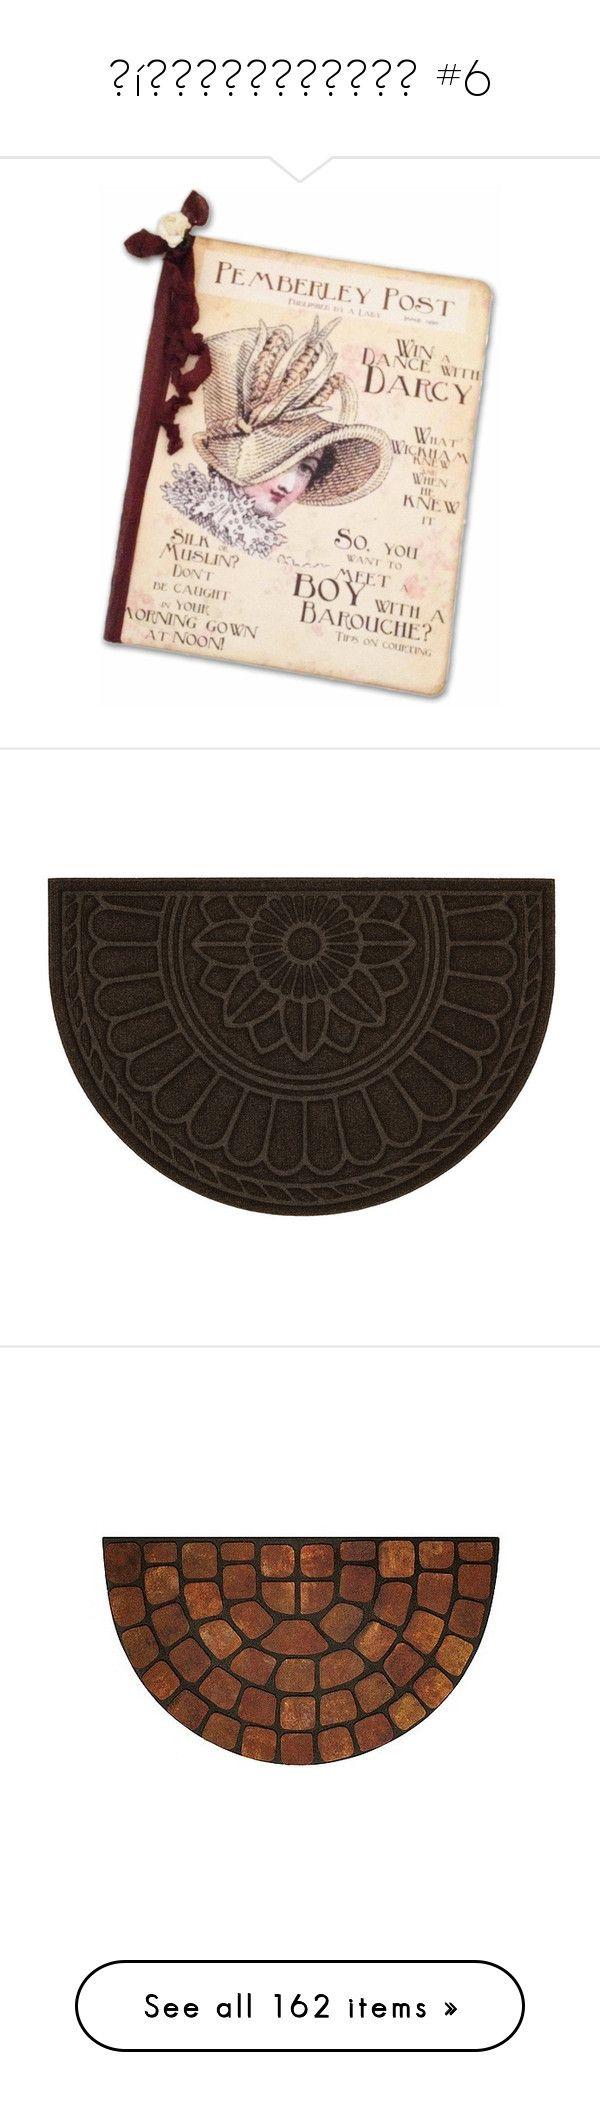 """ʍíՏϲҽӀӀɑղҽօմՏ #6"" by booknerd1326 ❤ liked on Polyvore featuring home, outdoors, outdoor decor, brown, rope doormats, beige stone, outdoor rubber mats, rubber doormat, stone mat and rubber door mats"